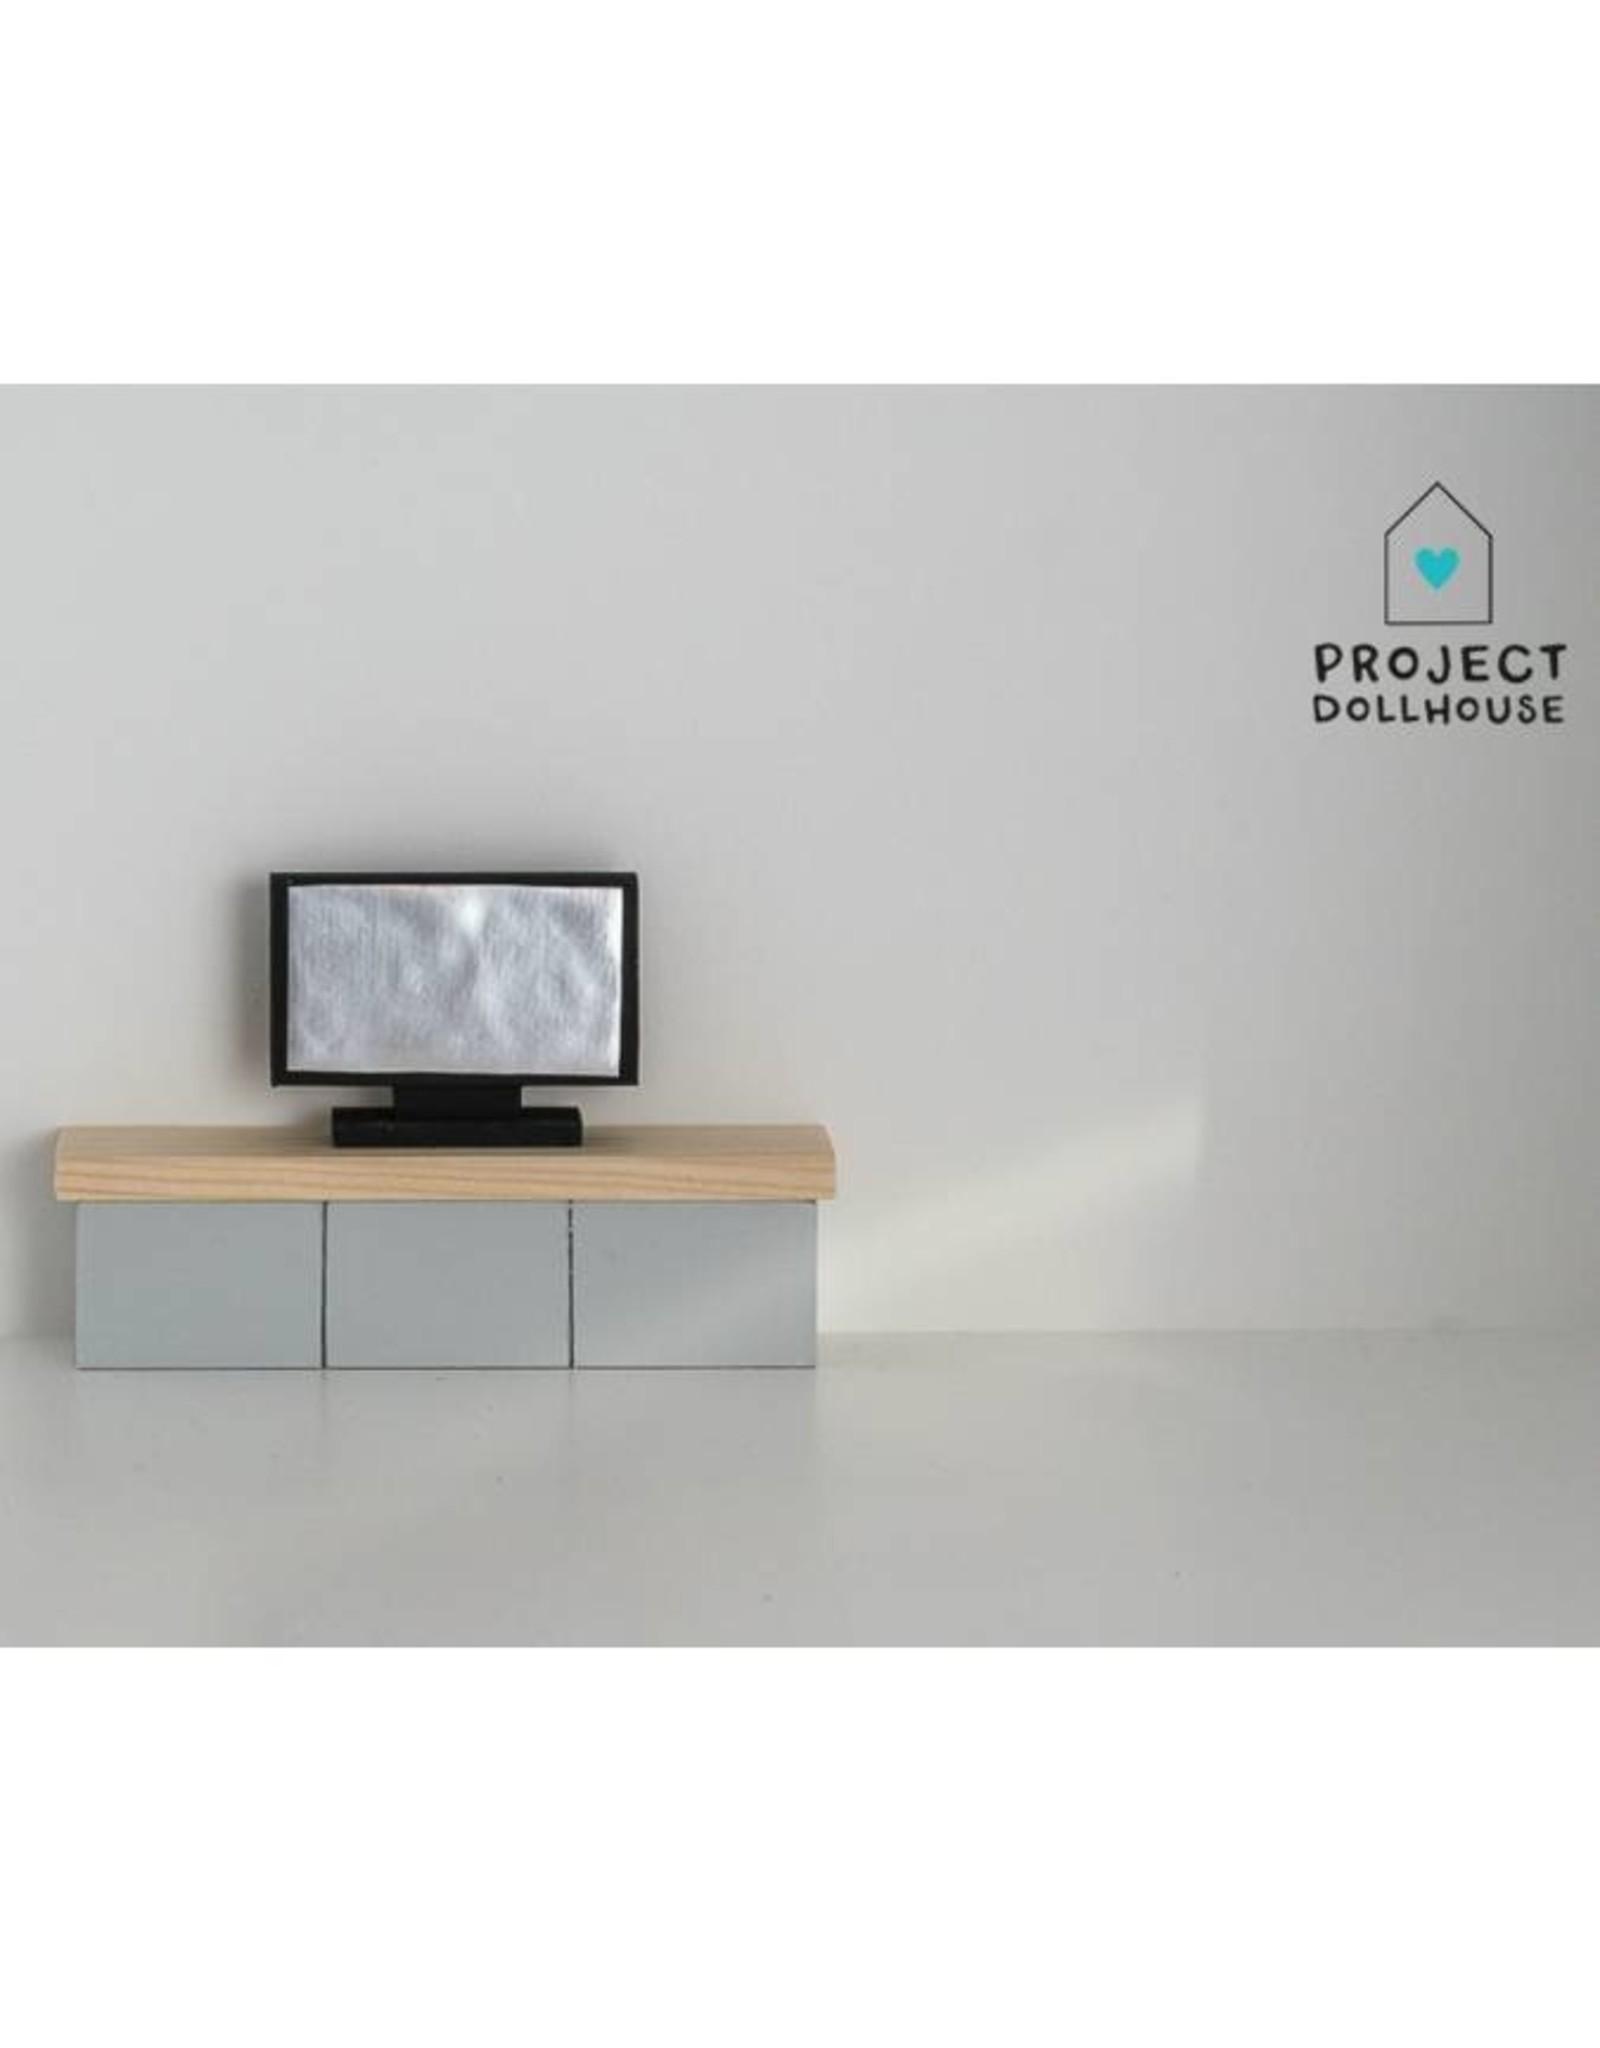 Project Dollhouse Flatscreen TV